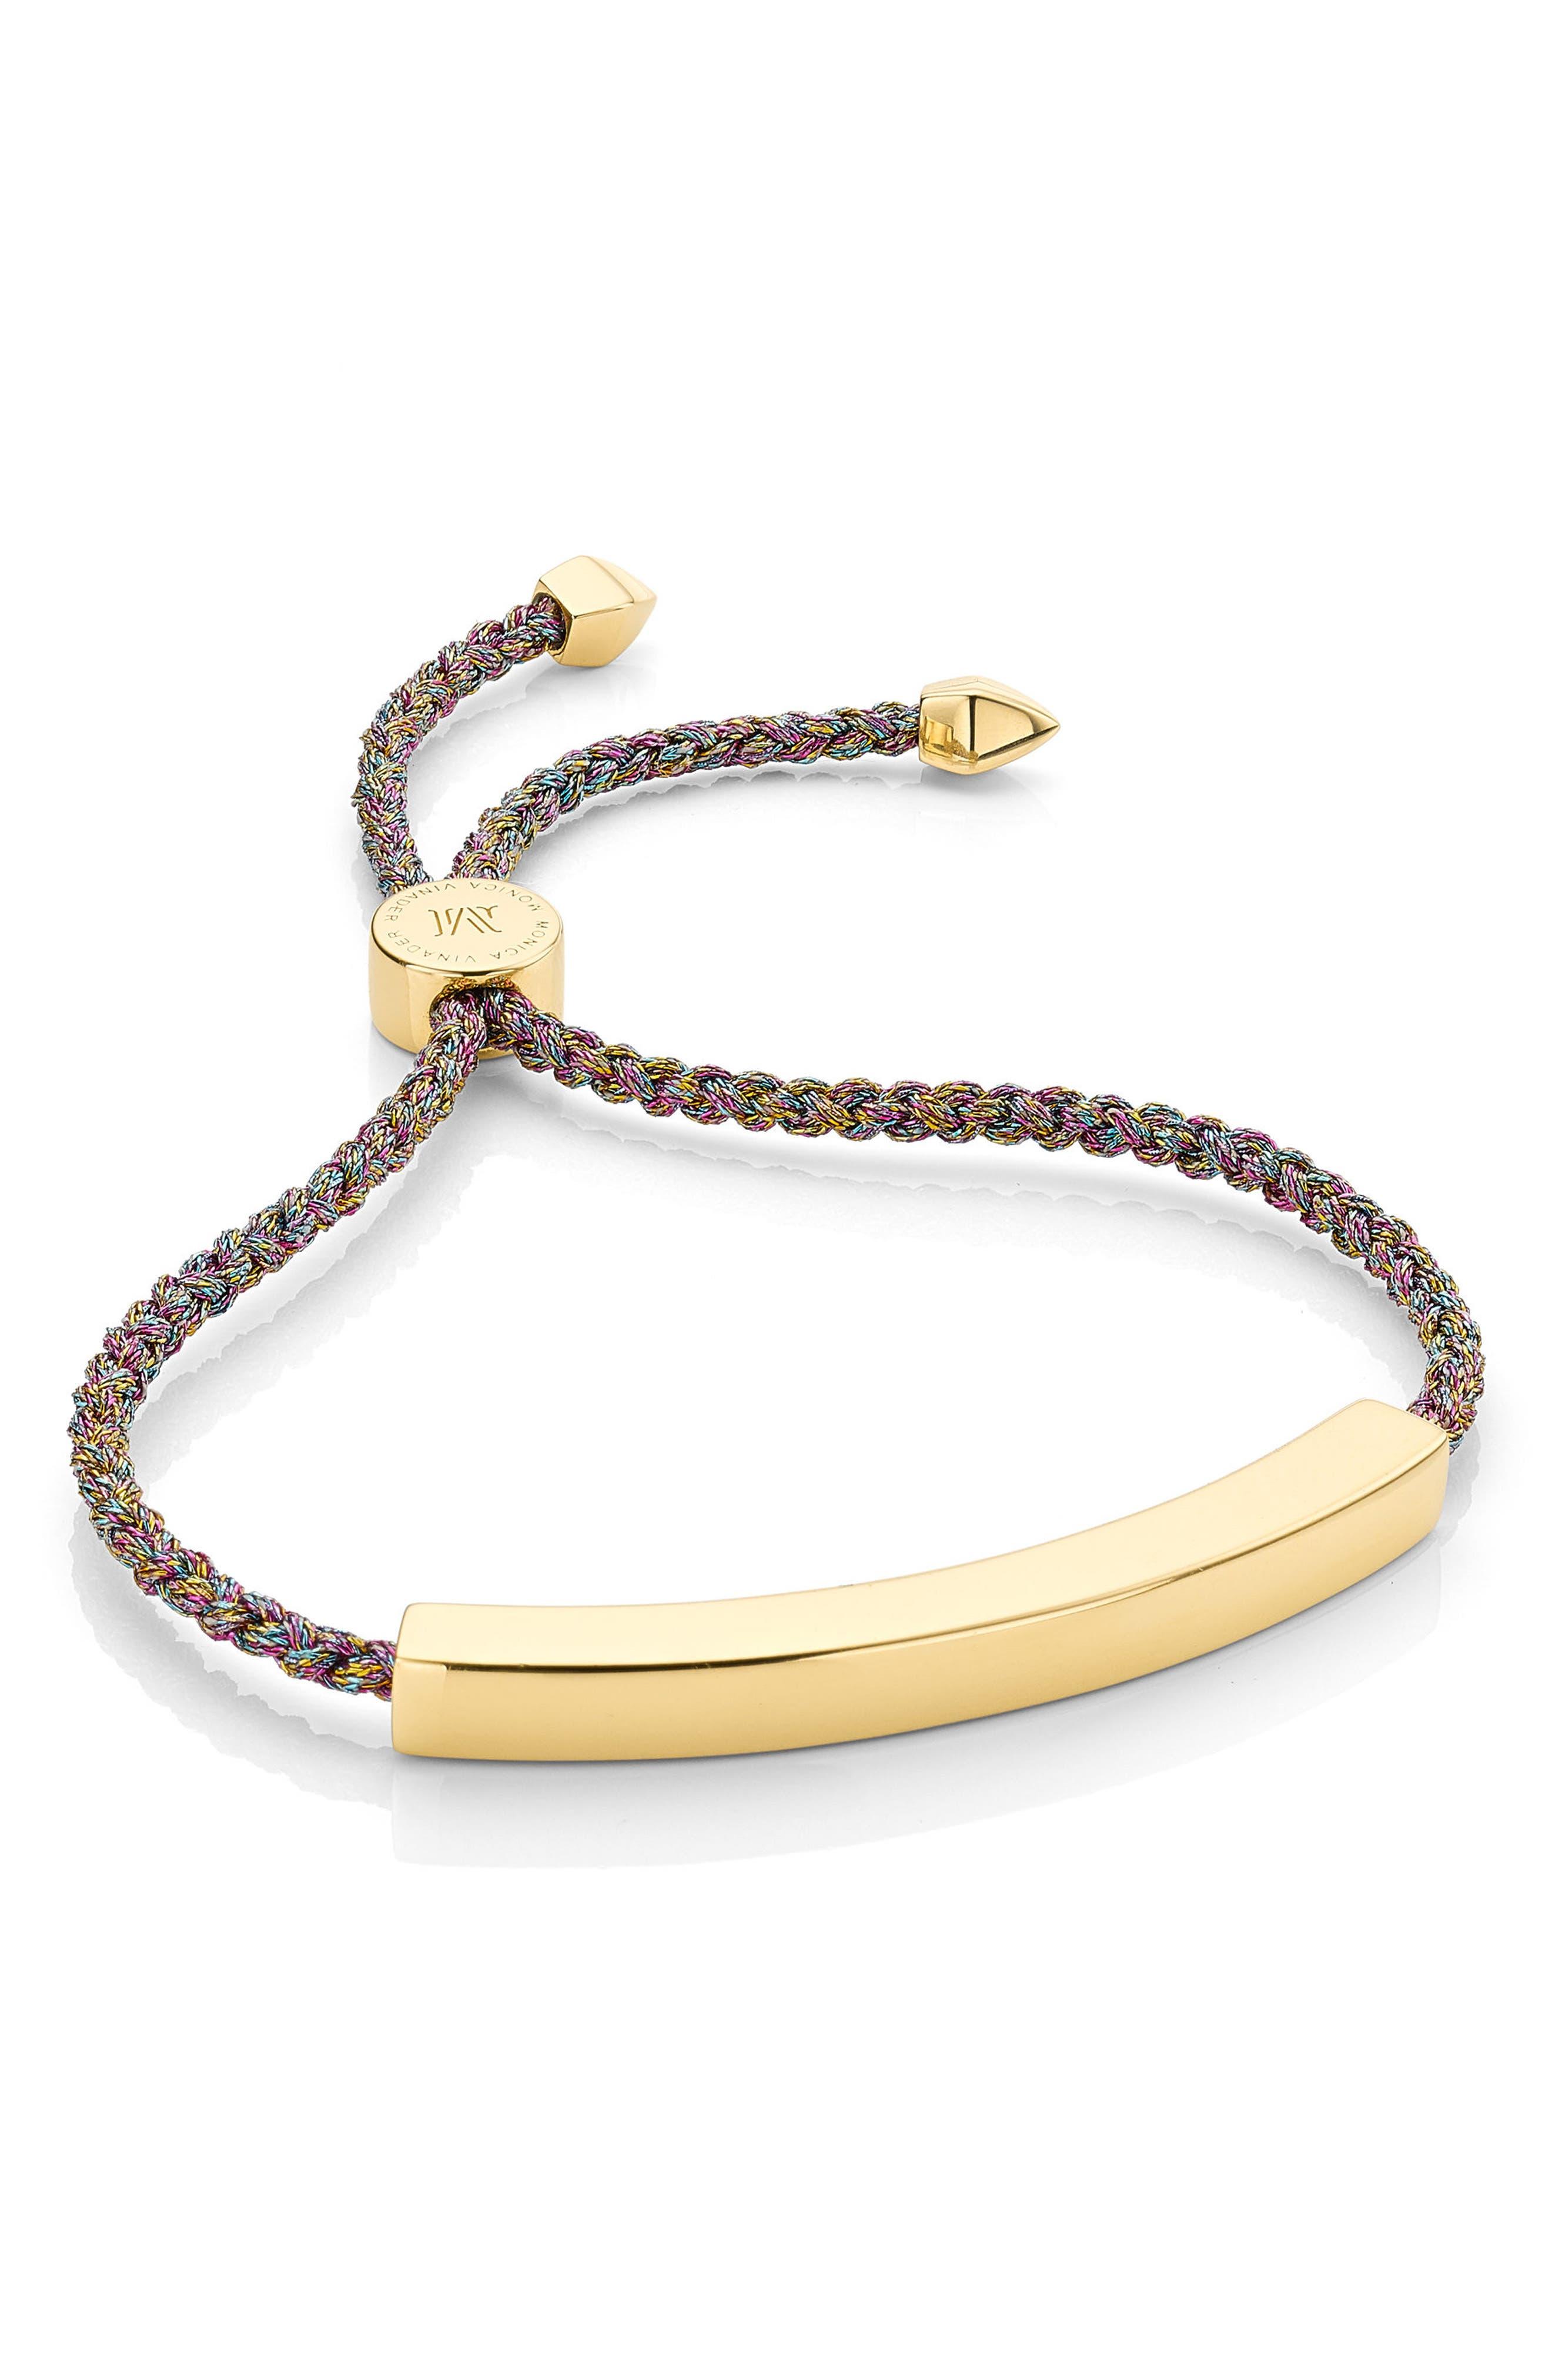 Engravable Large Linear Friendship Bracelet,                         Main,                         color, RAINBOW METALLIC/ YELLOW GOLD